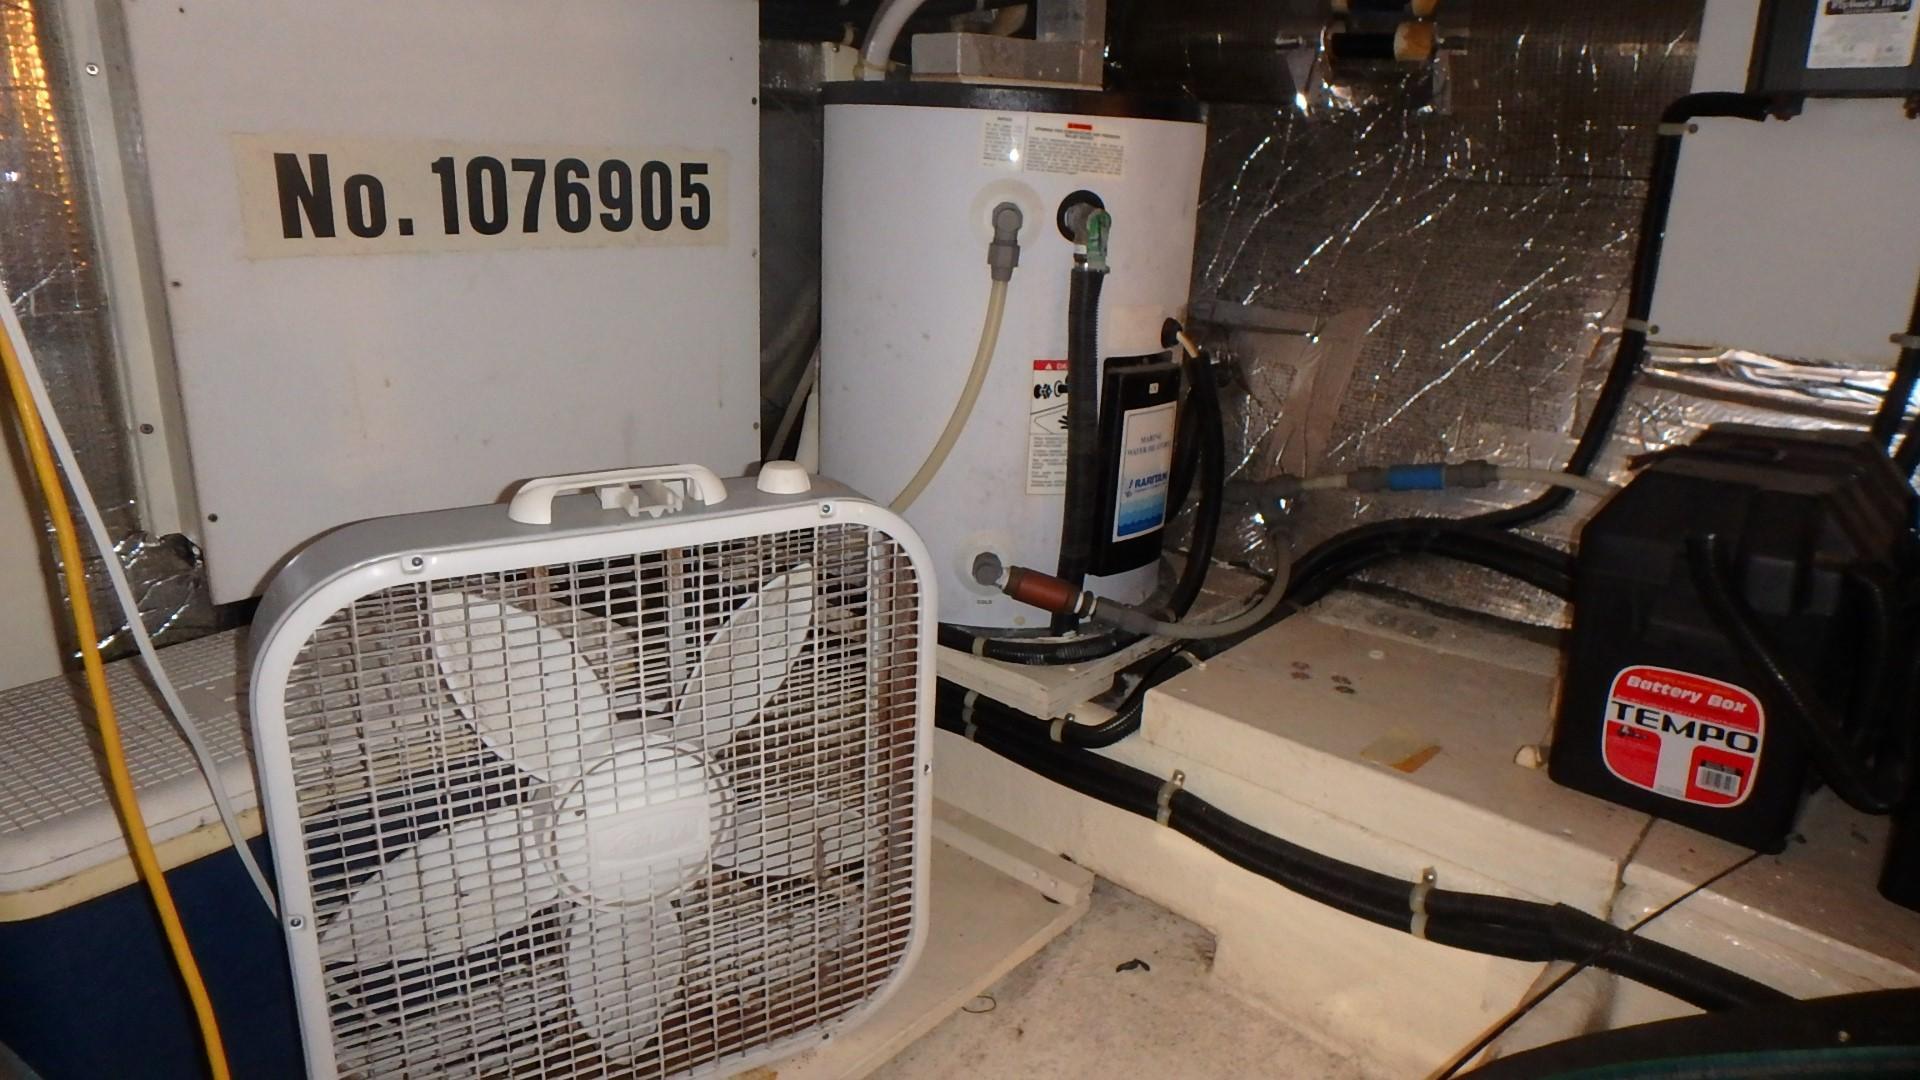 Navigator 4800 CLASSIC - Large Hot Water Heater